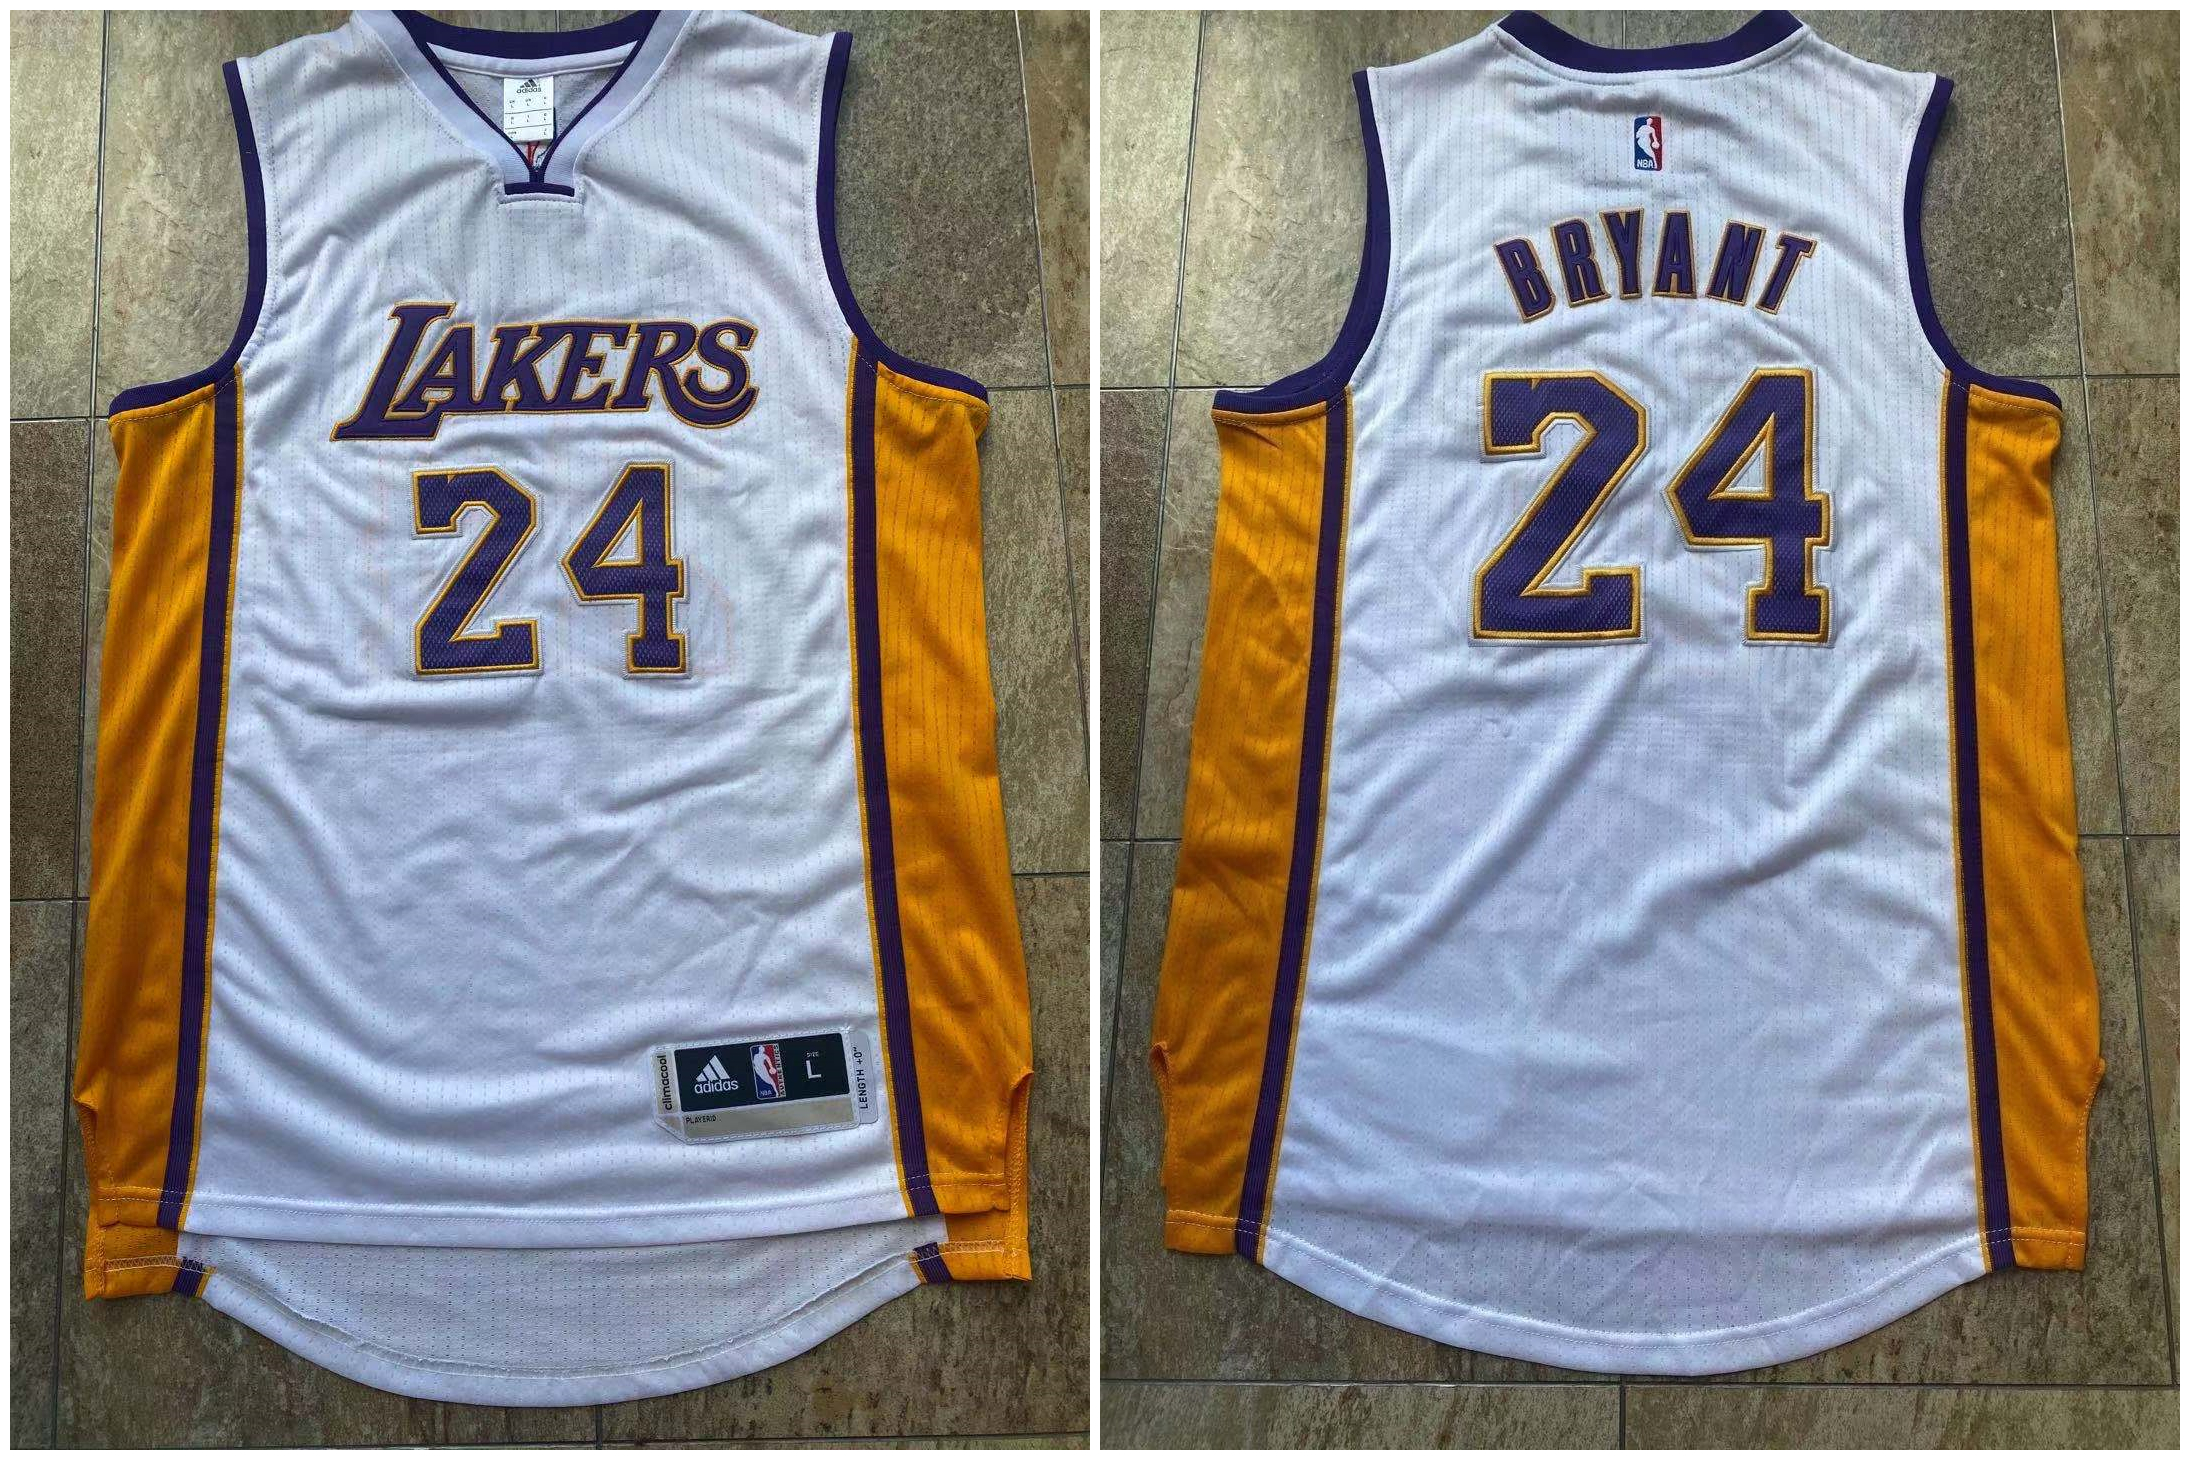 Lakers 24 Kobe Bryant White Adidas Swingman Jersey